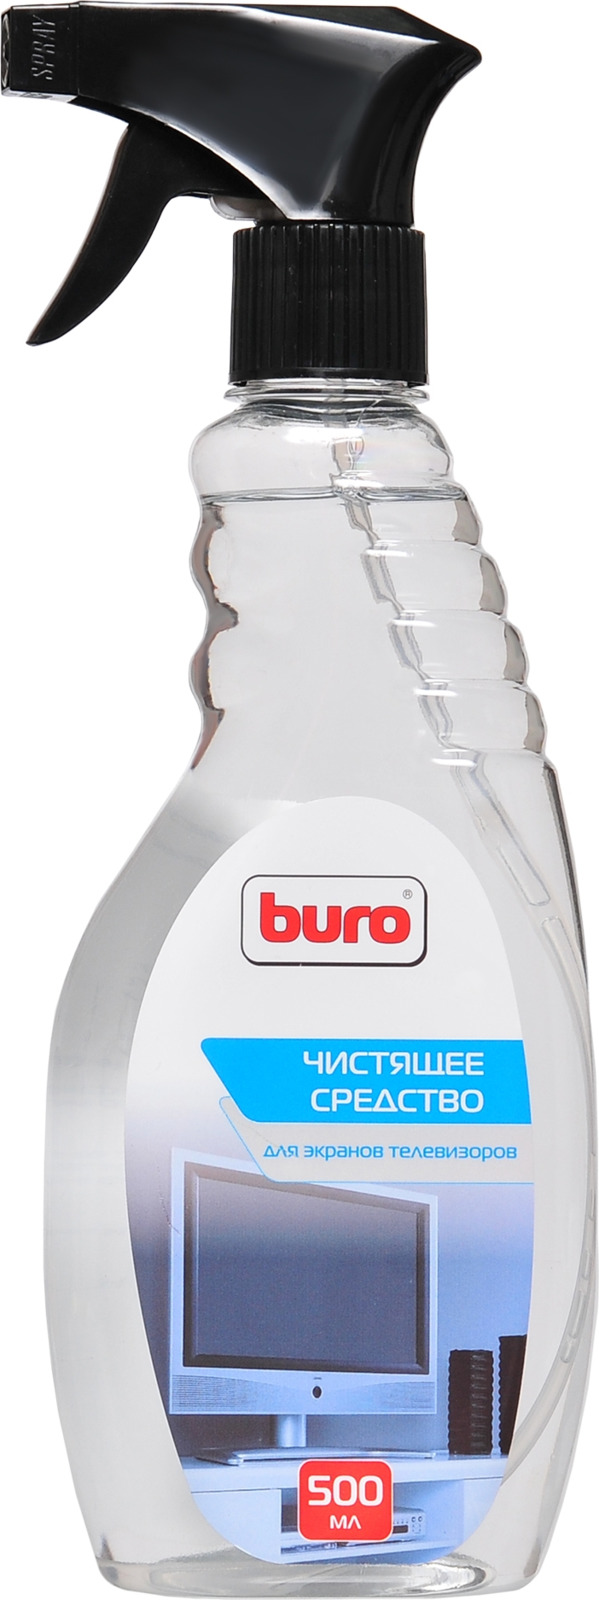 Спрей Buro для экранов телевизоров, 500 мл, BU-TV_LCD500